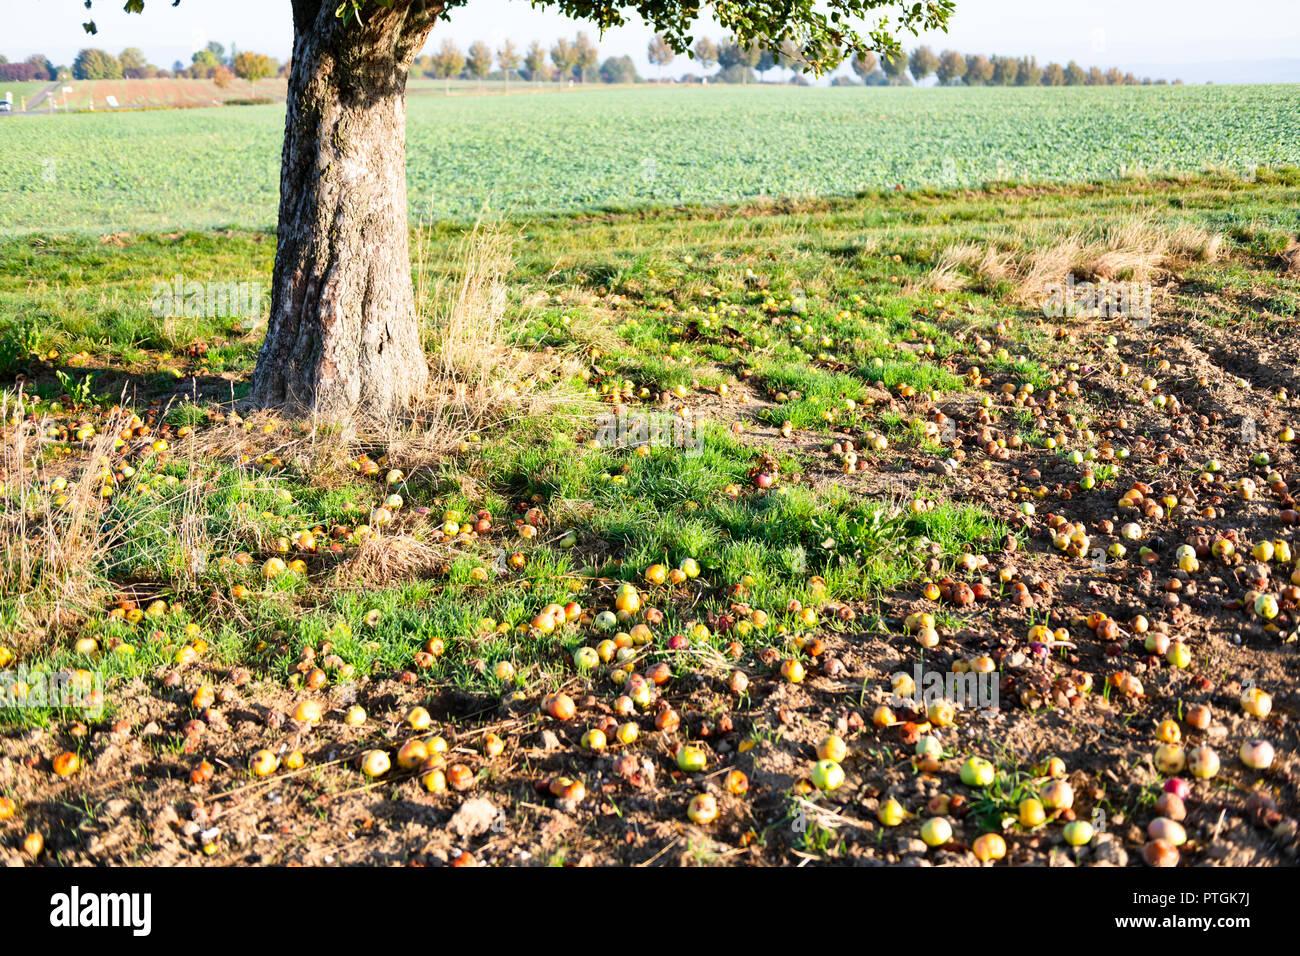 Fallen apples next to tree on field in autumn. - Stock Image